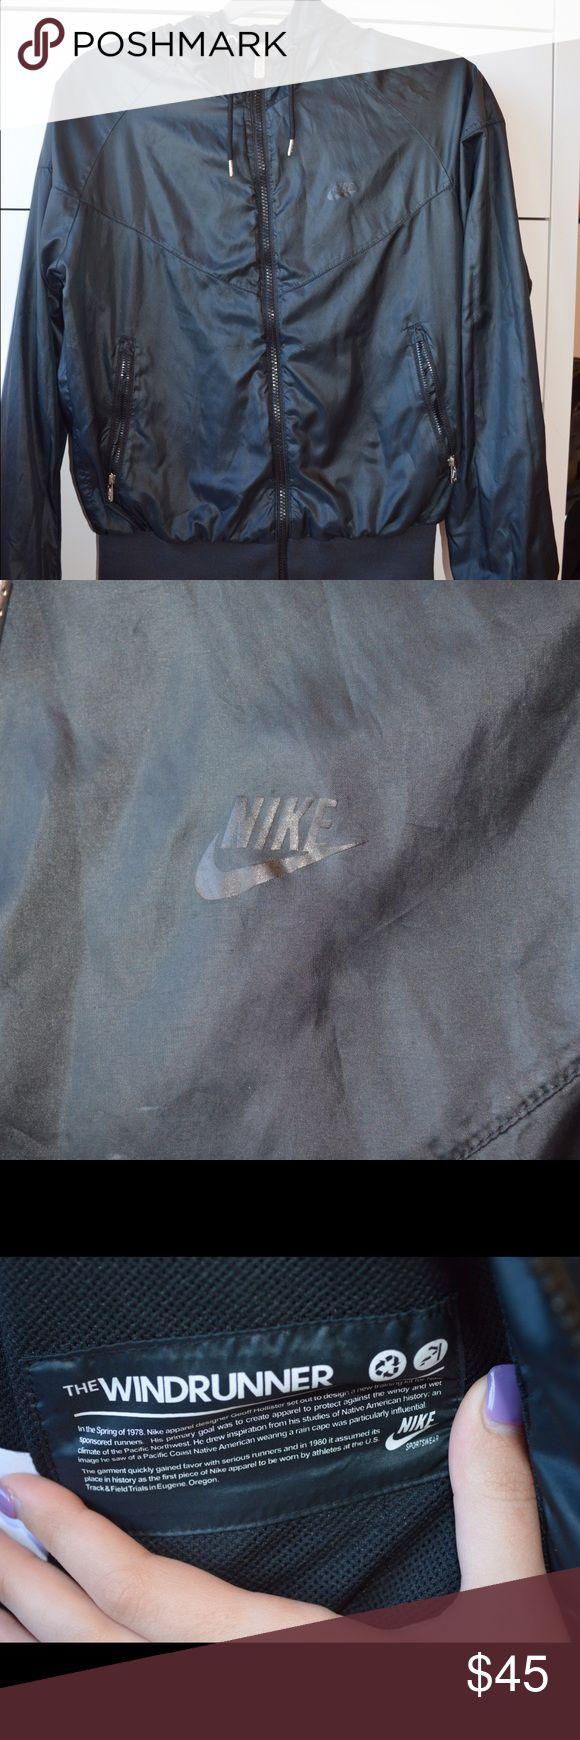 Black Nike Windrunner Jacket Black Nike Windrunner jacket. Size medium. In excellent used condition. Nike Tops Sweatshirts & Hoodies